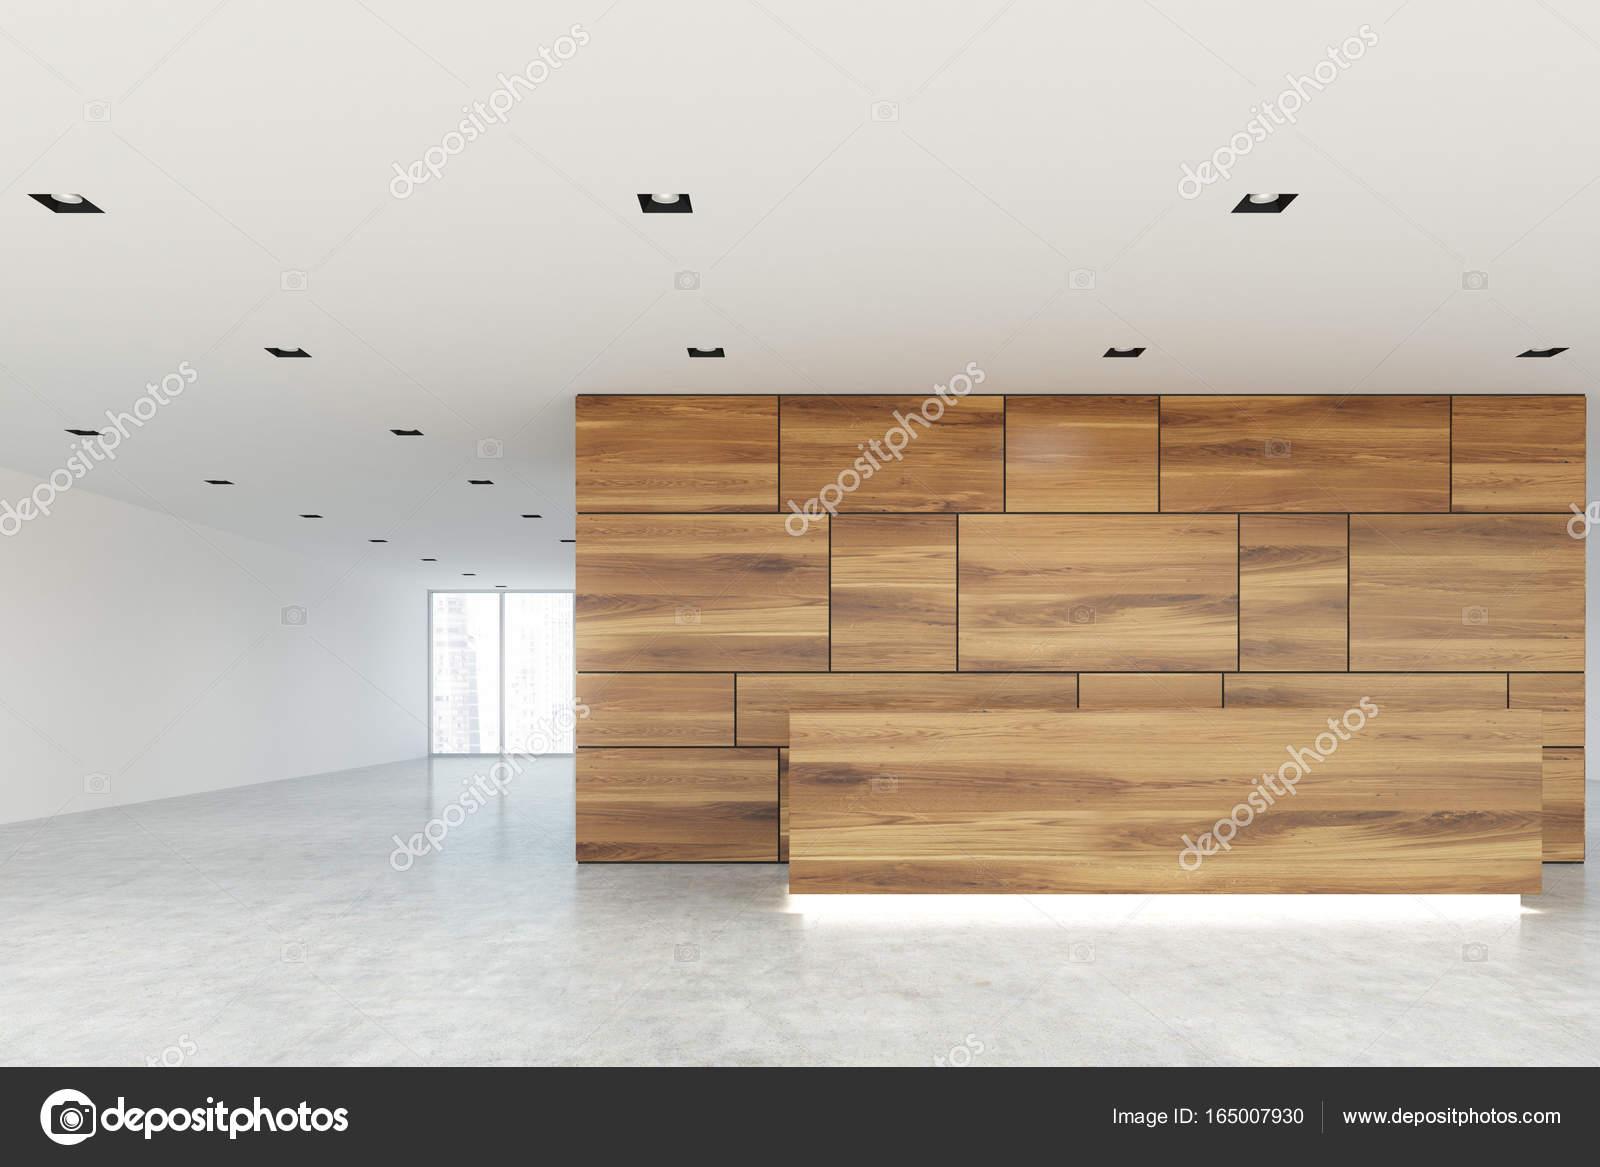 Lobby mit Rezeption aus Holz und Glas — Stockfoto ...